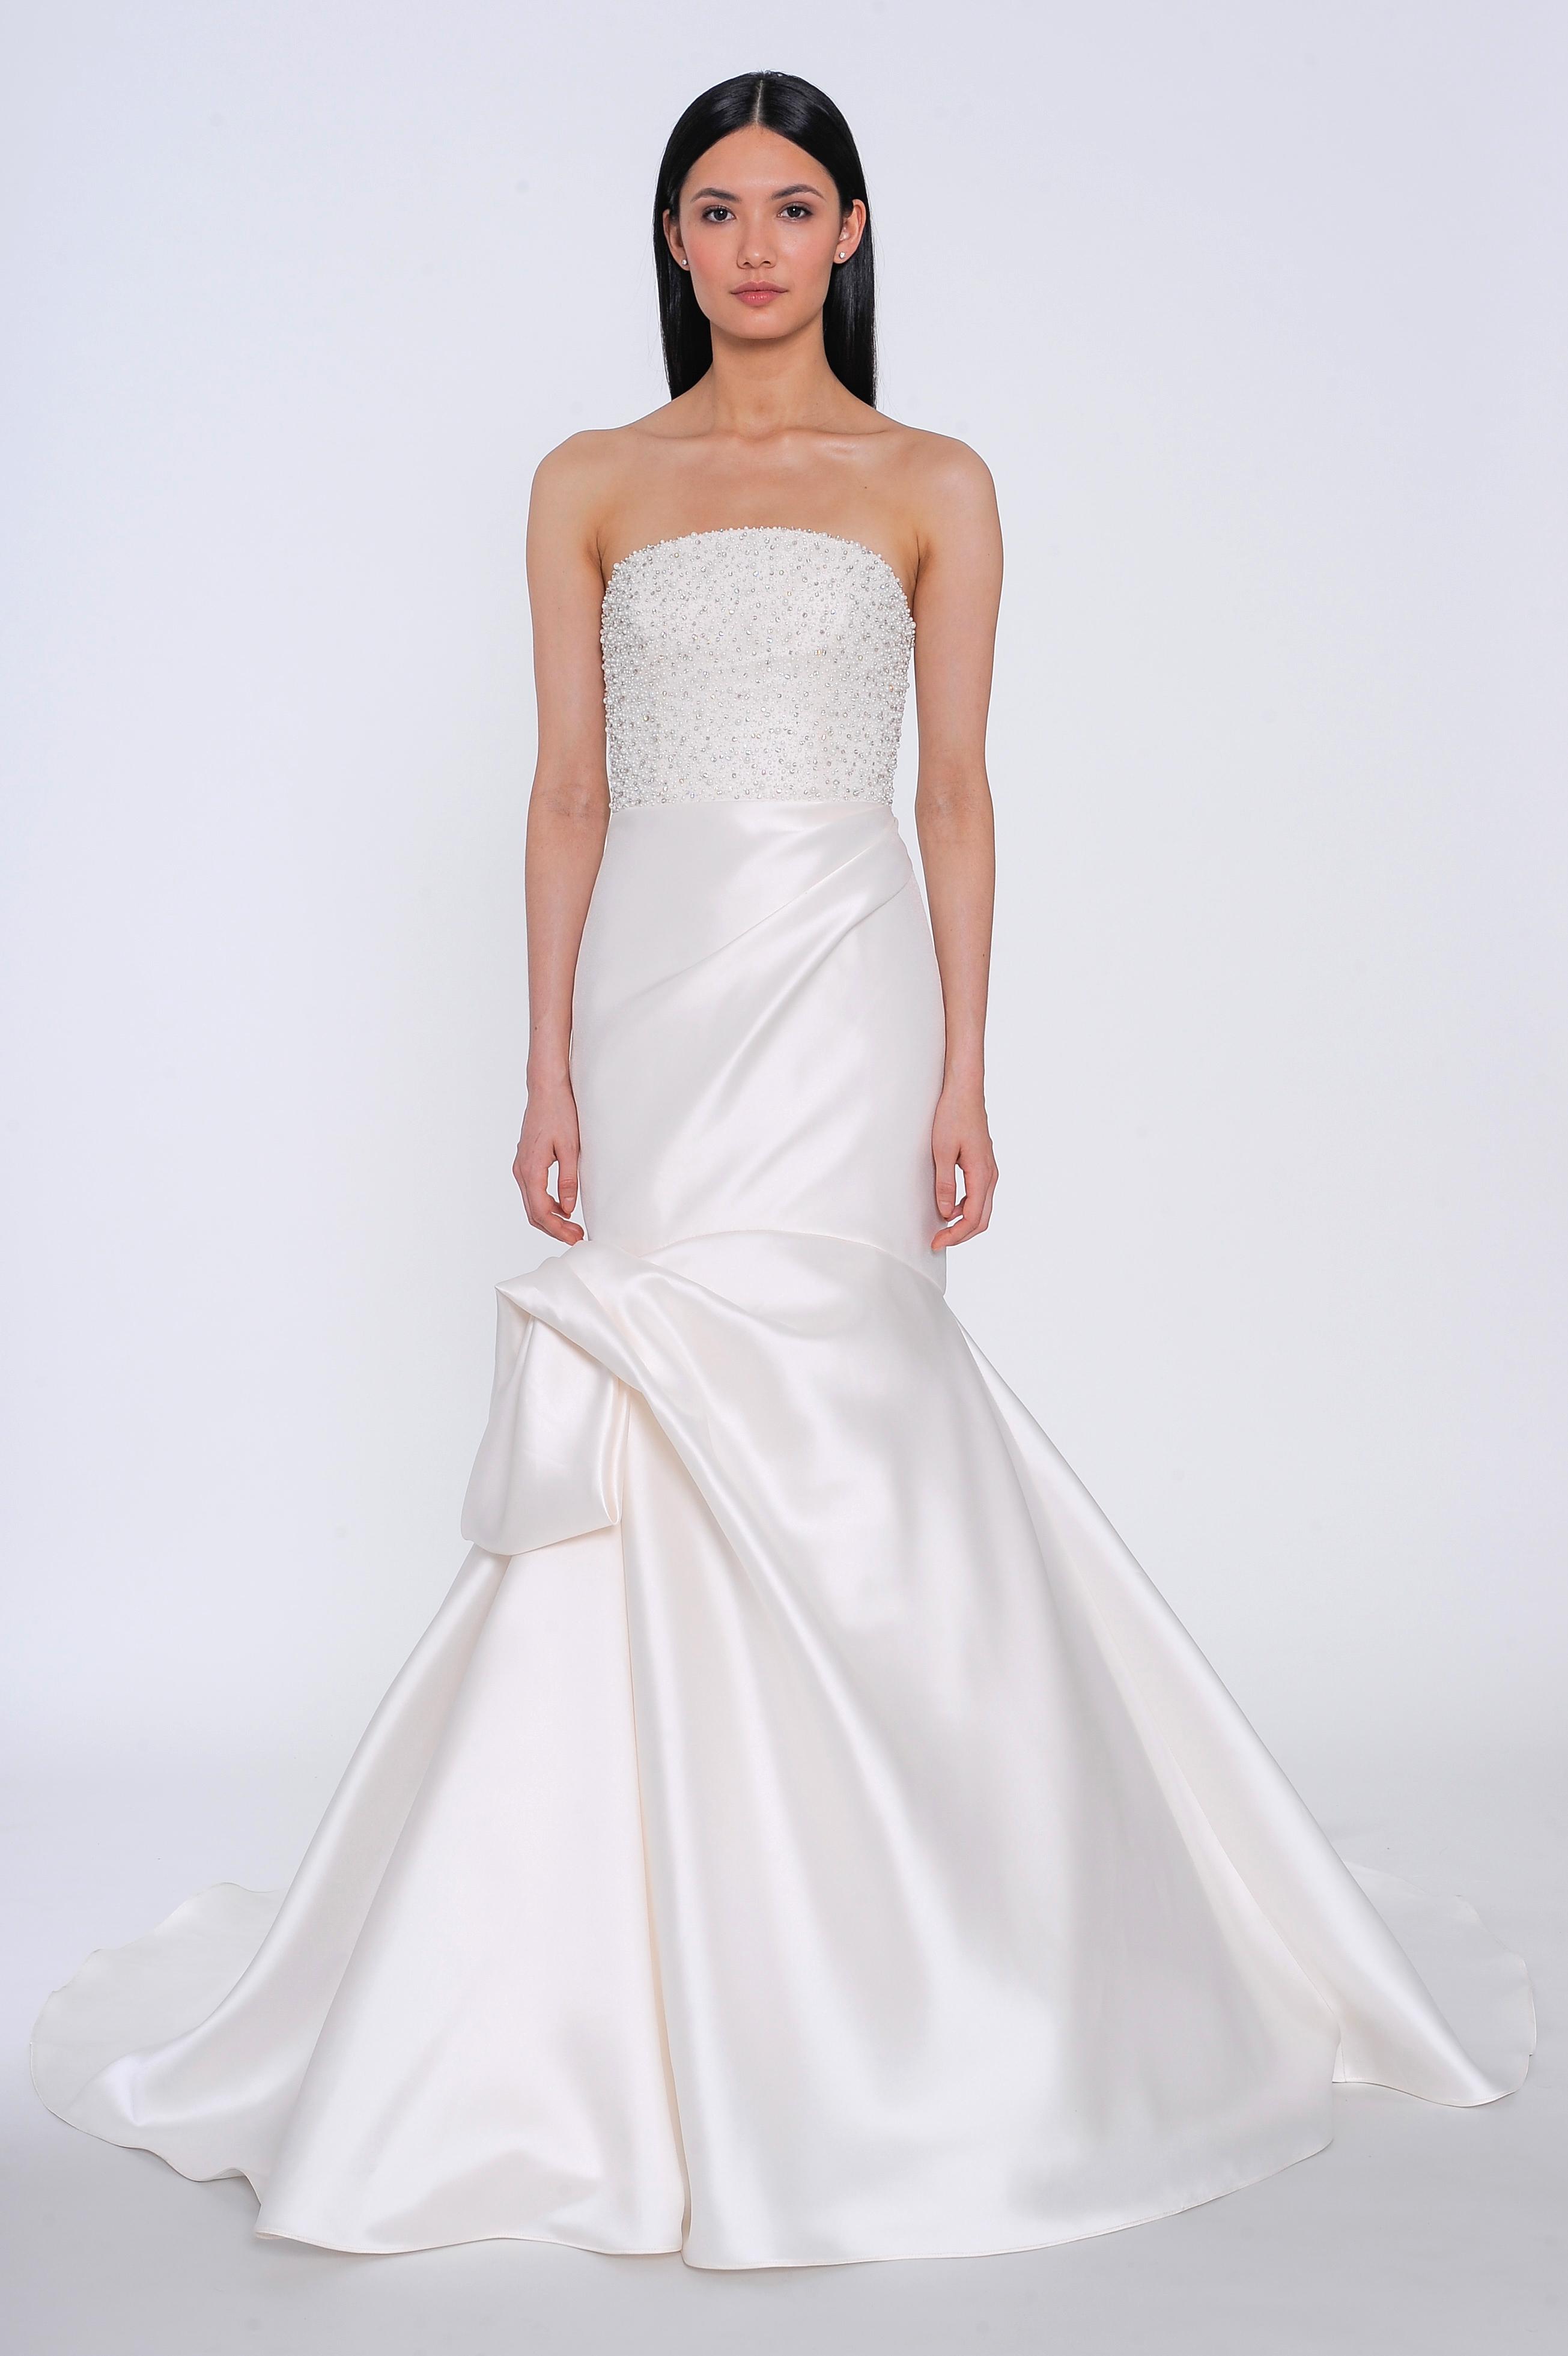 allison webb wedding dress spring 2019 satin strapless